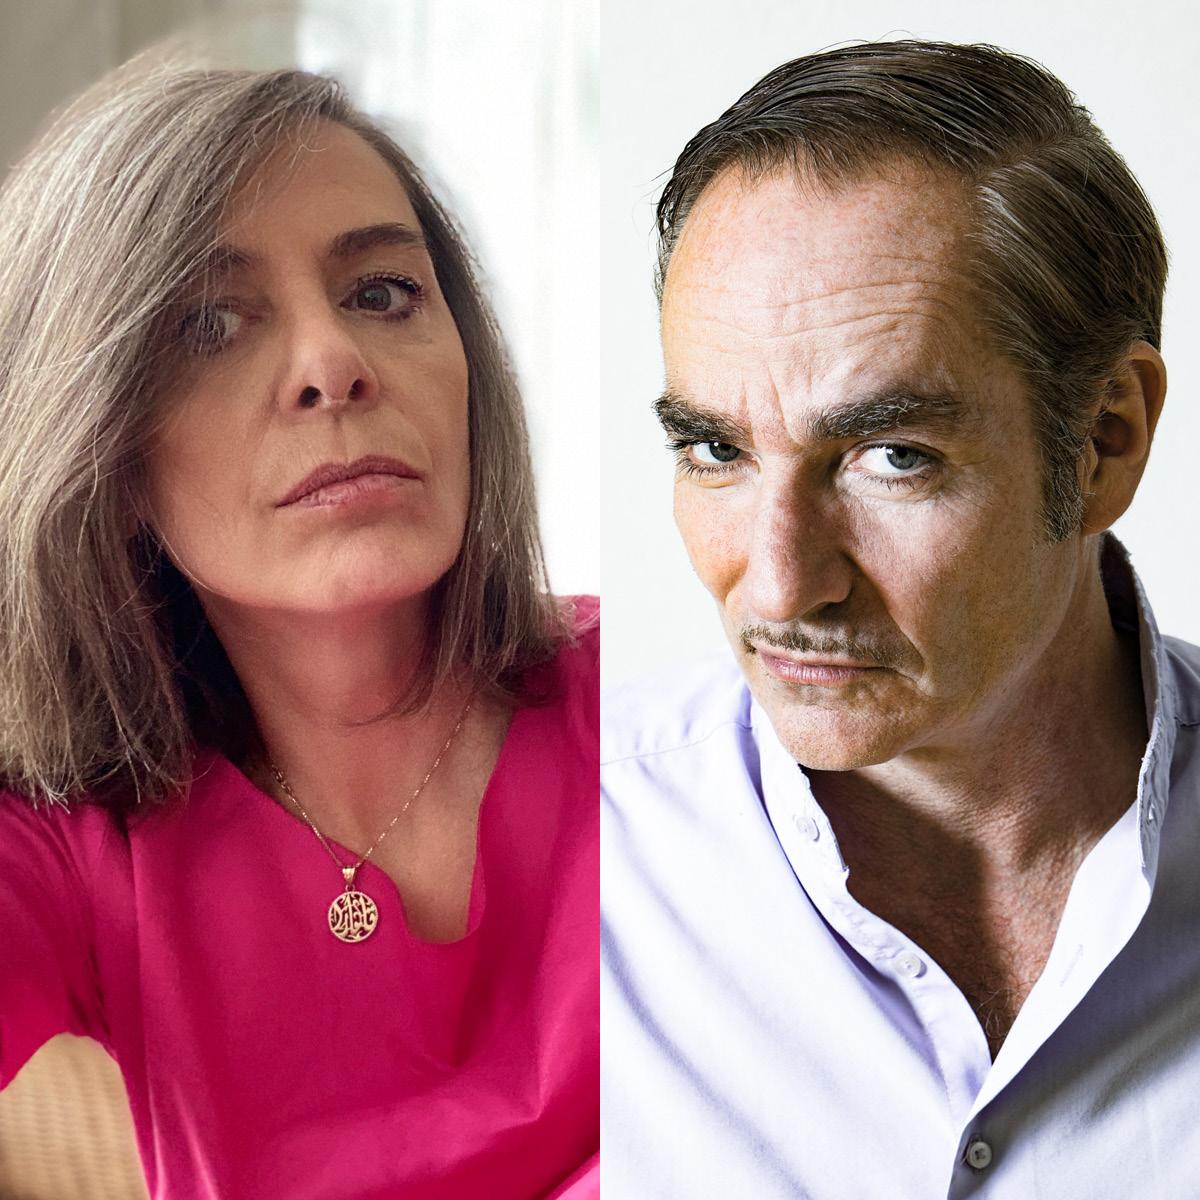 Claudia Basrawi (Foto: Claudia Basrawi) & Ted Gaier (Foto: Frank Egel)